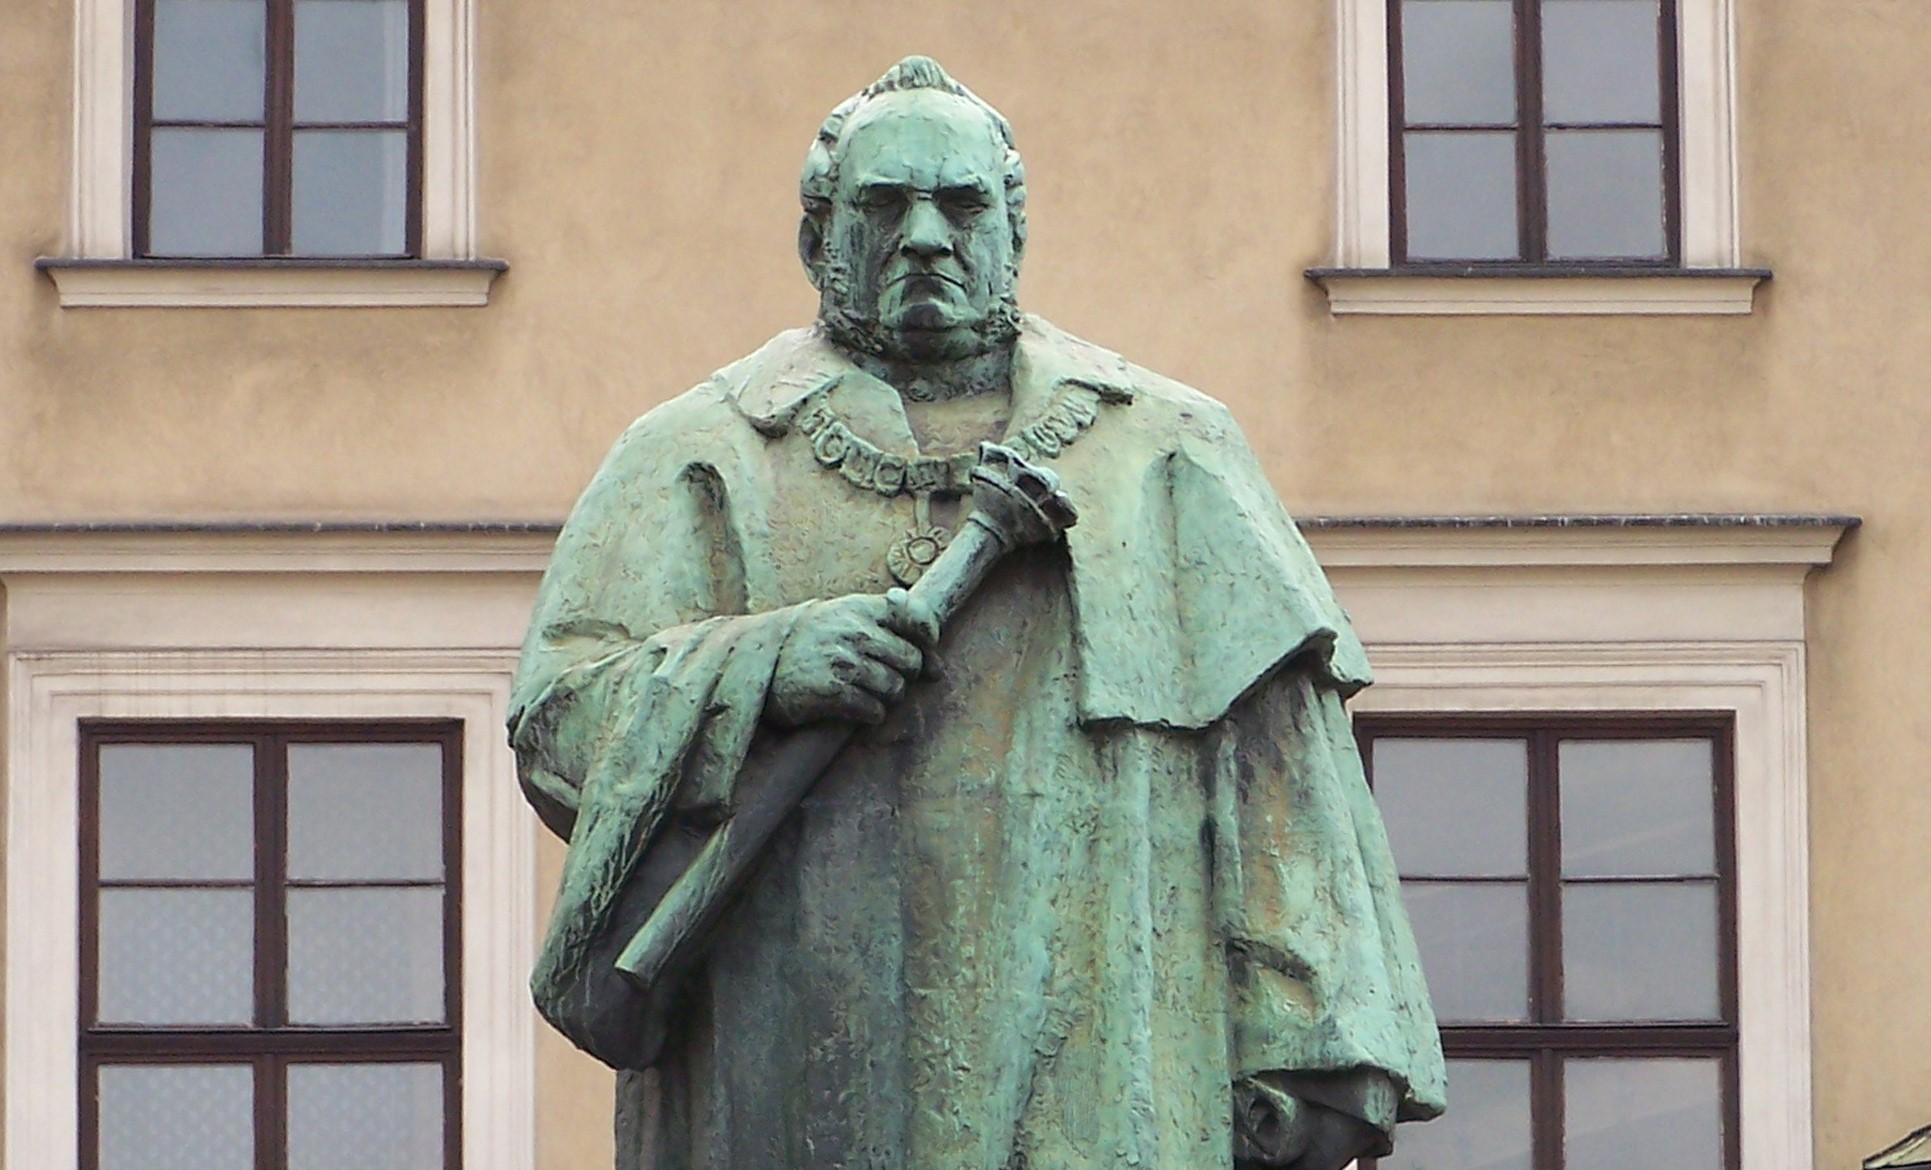 Józef Dietla looks upon the city he helped build